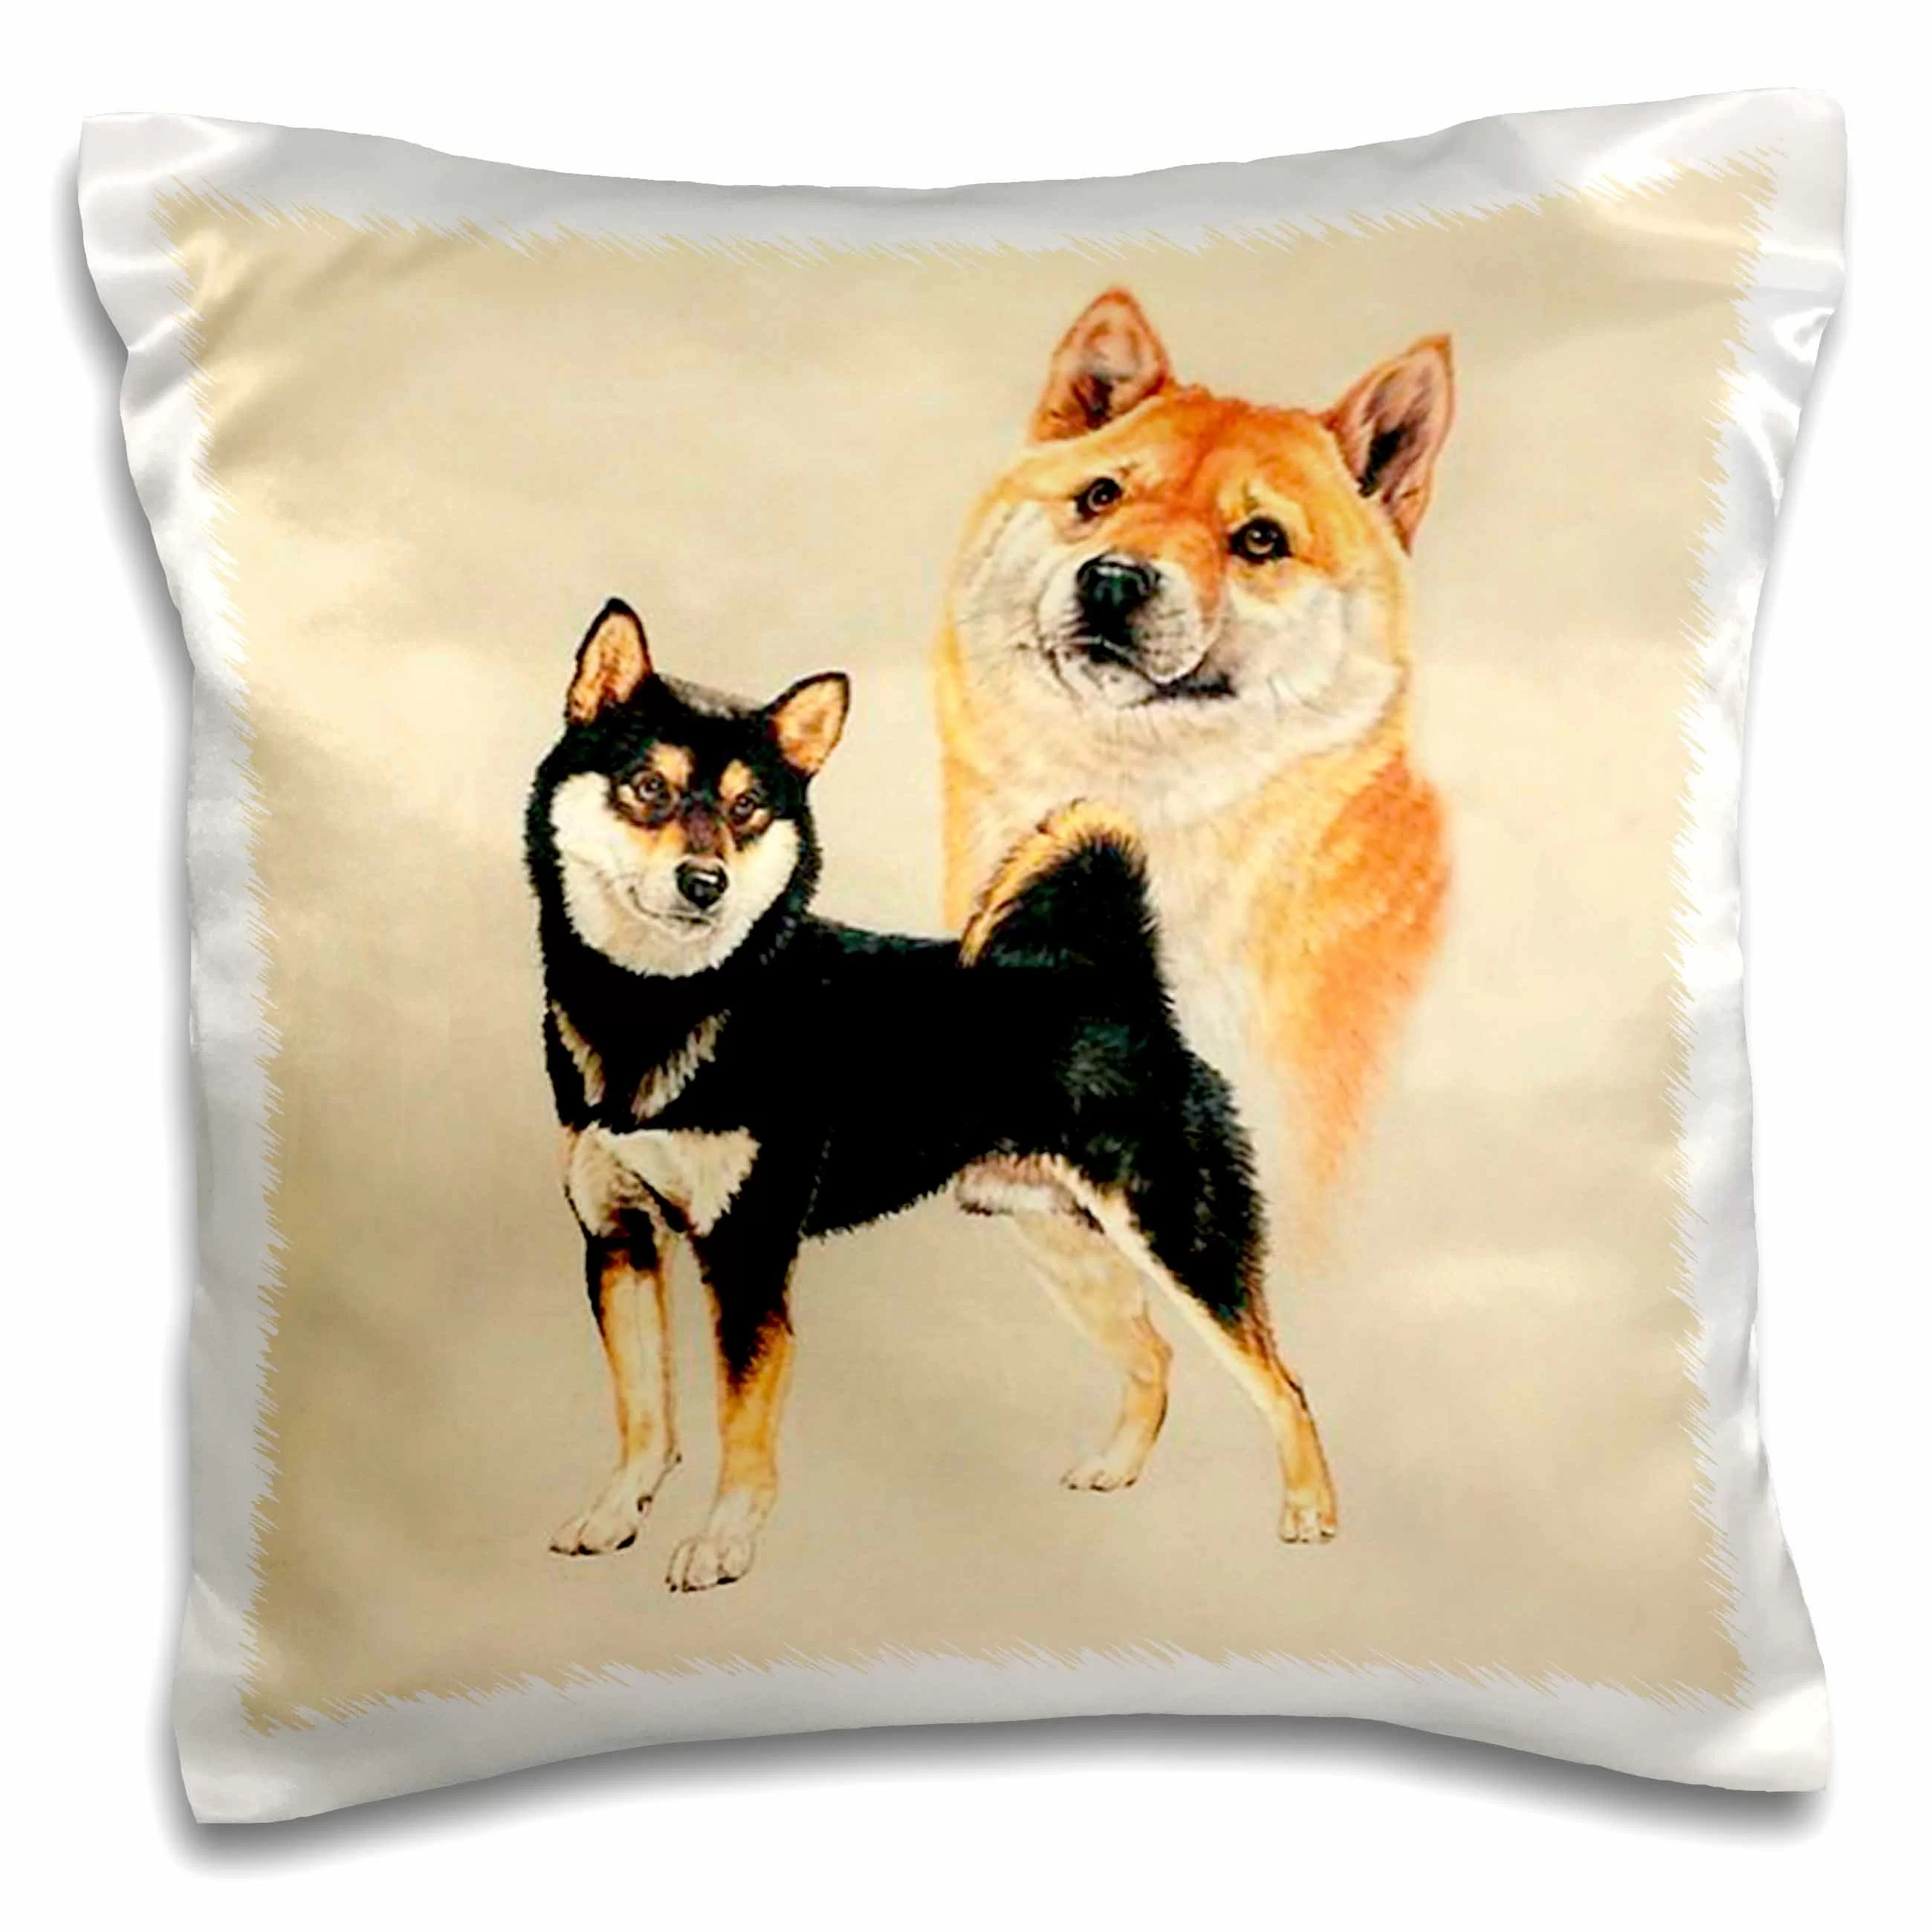 shiba inu pillow online